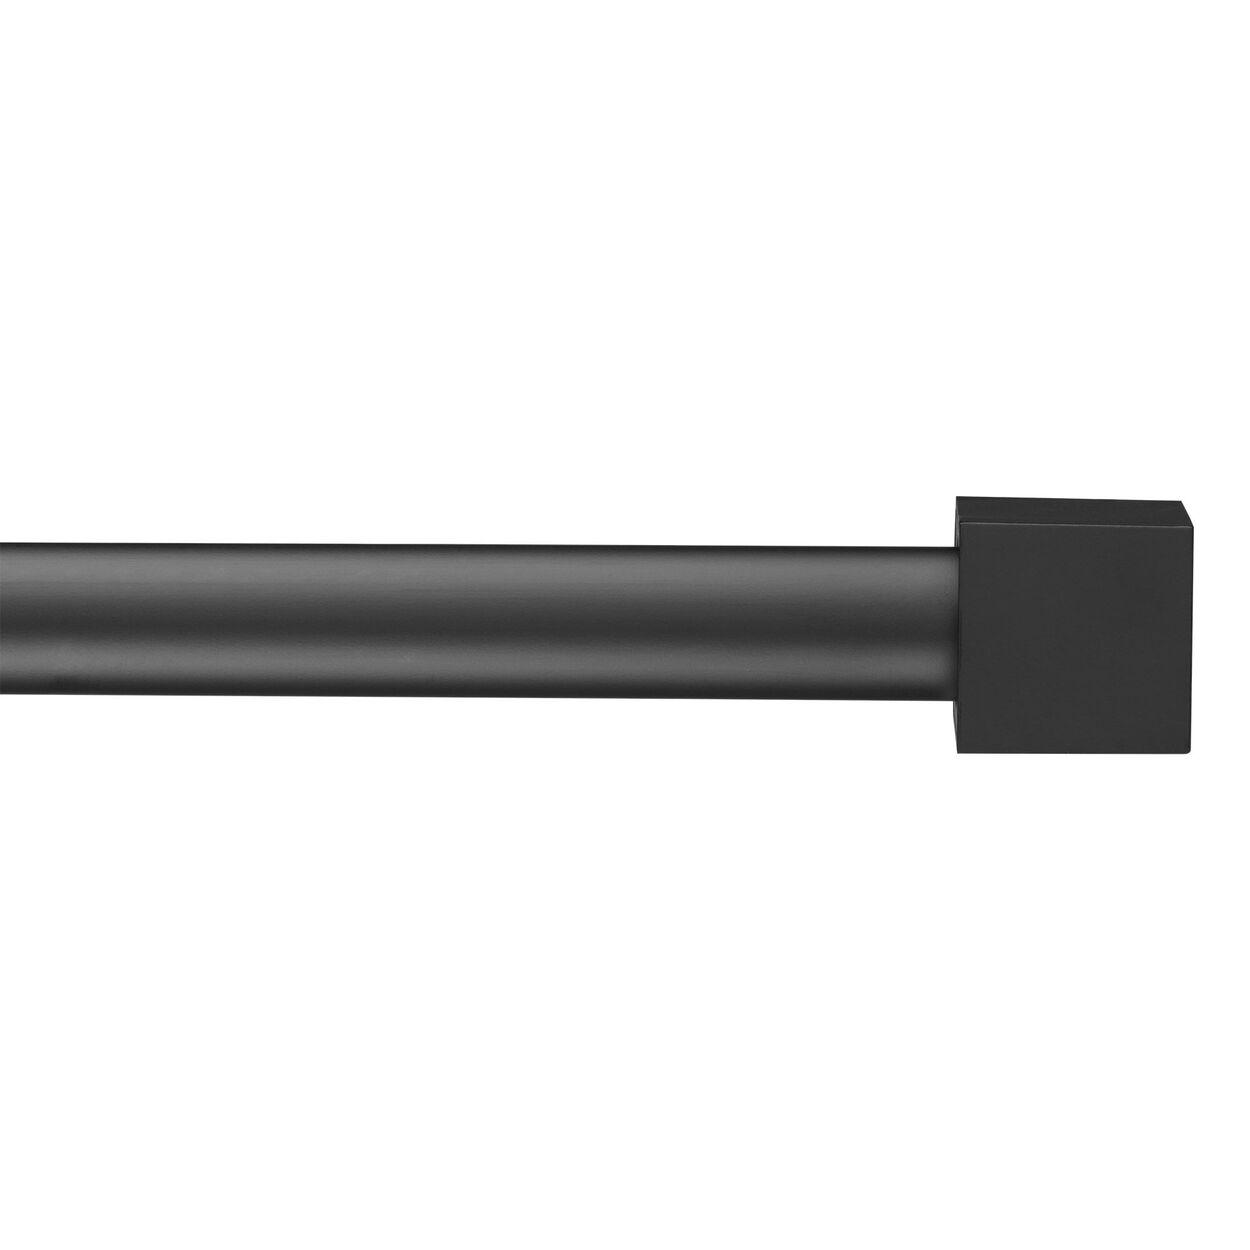 Cube Curtain Rod Set - Diameter 25mm